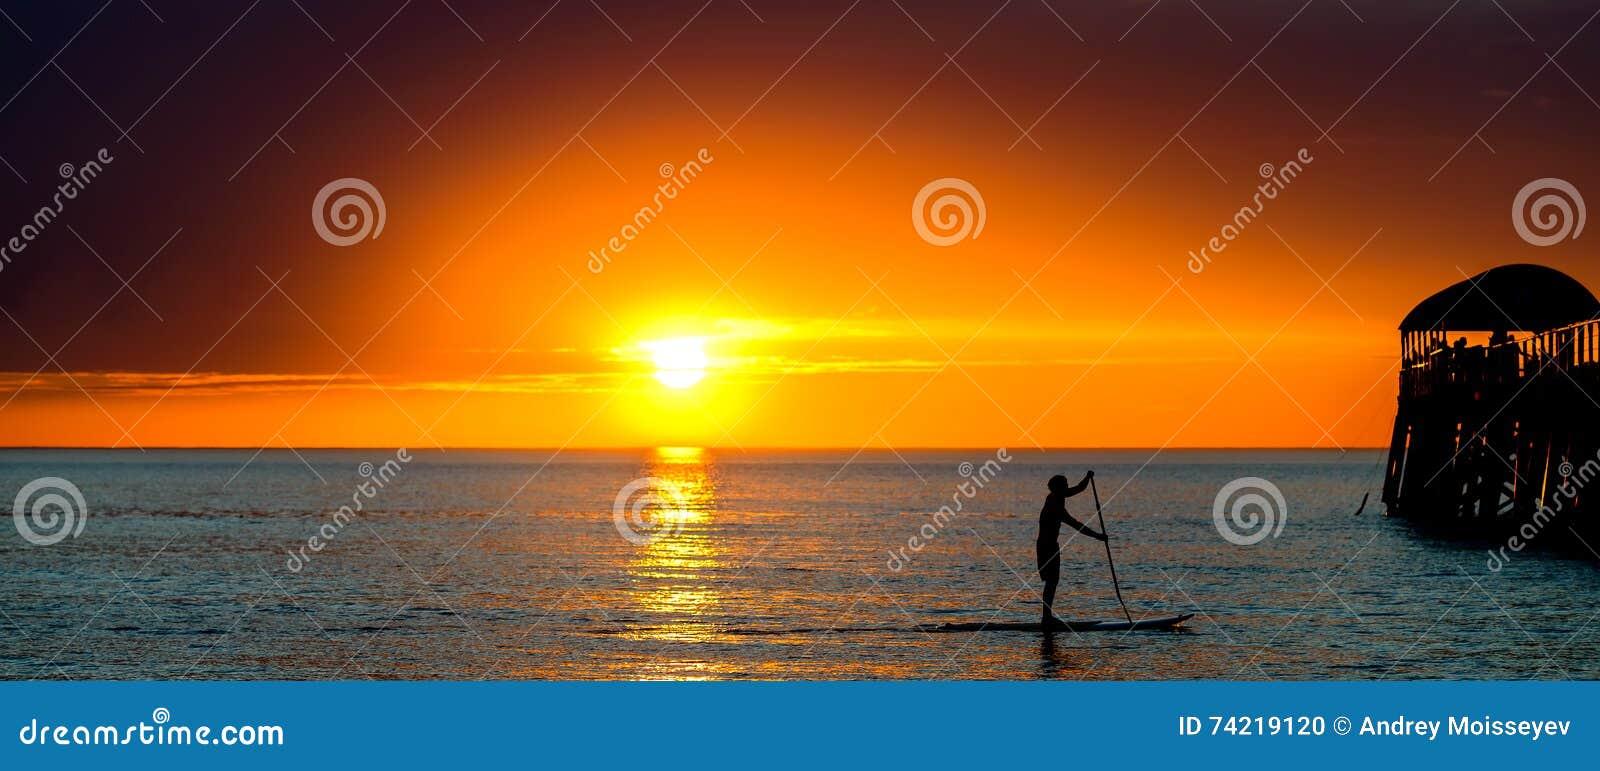 Paddle surfing man